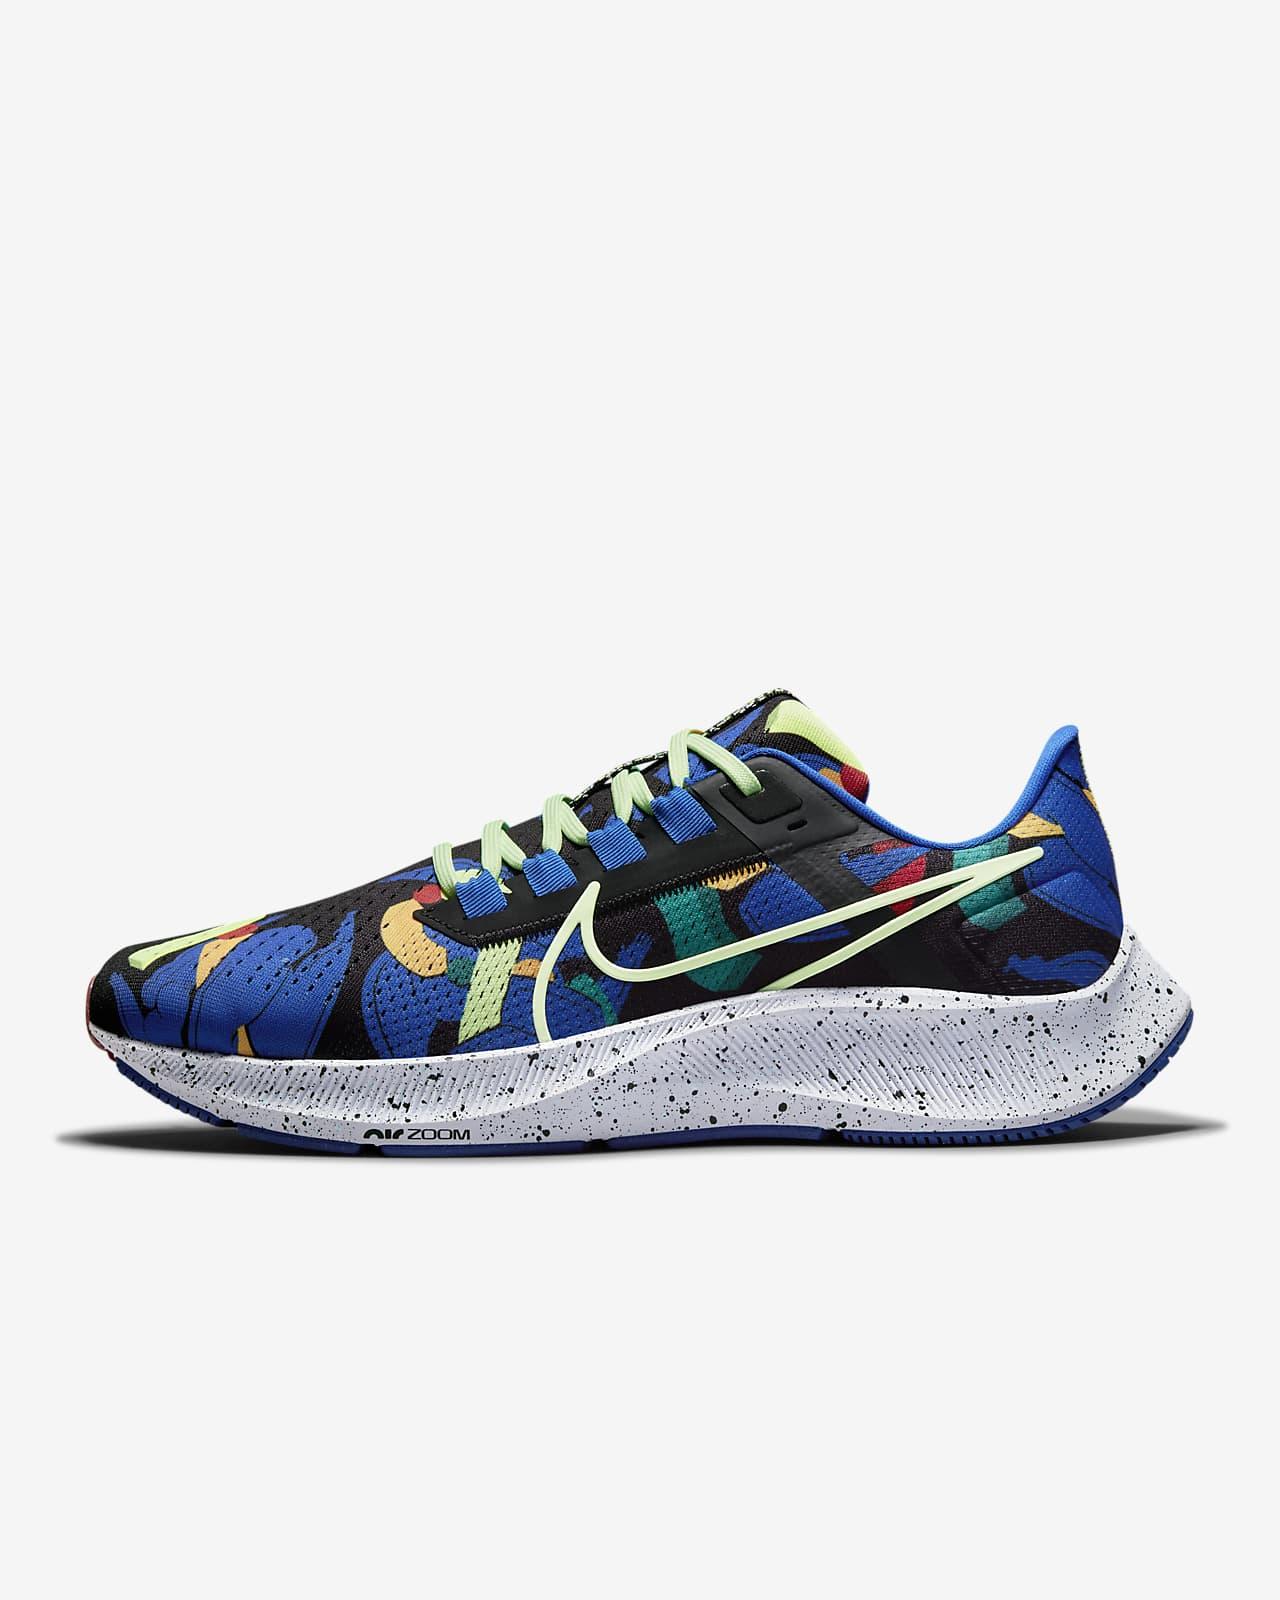 Nike Air Zoom Pegasus 38 A.I.R. Kelly Anna London Men's Road Running Shoes